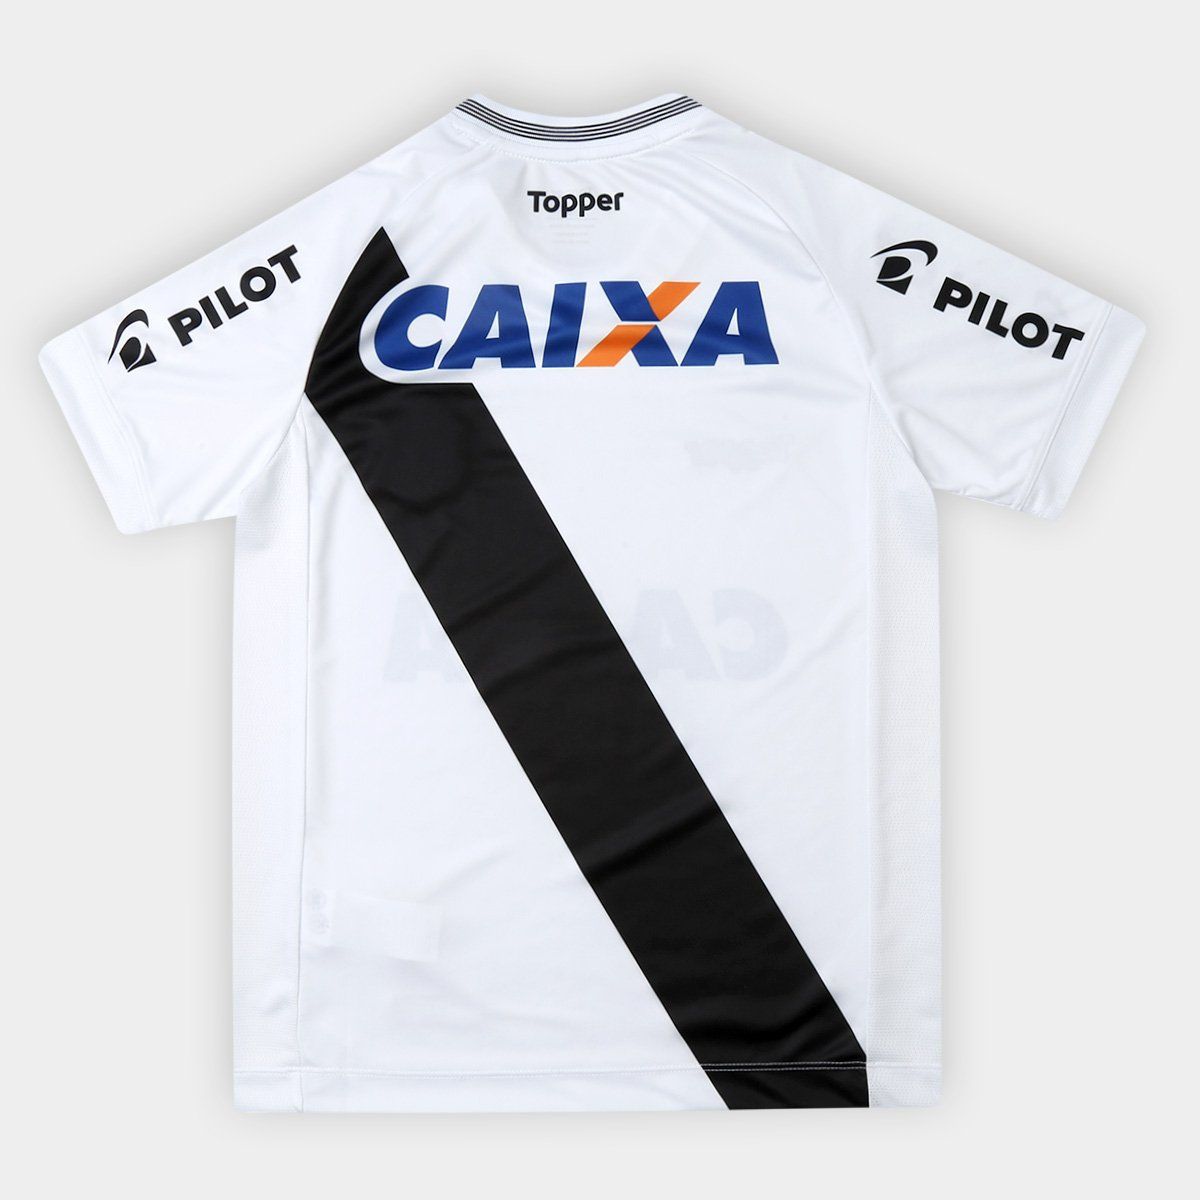 ... Camisa Ponte Preta Infantil I 2018 s n° - Torcedor Topper - Branco e . 5f56995139b38